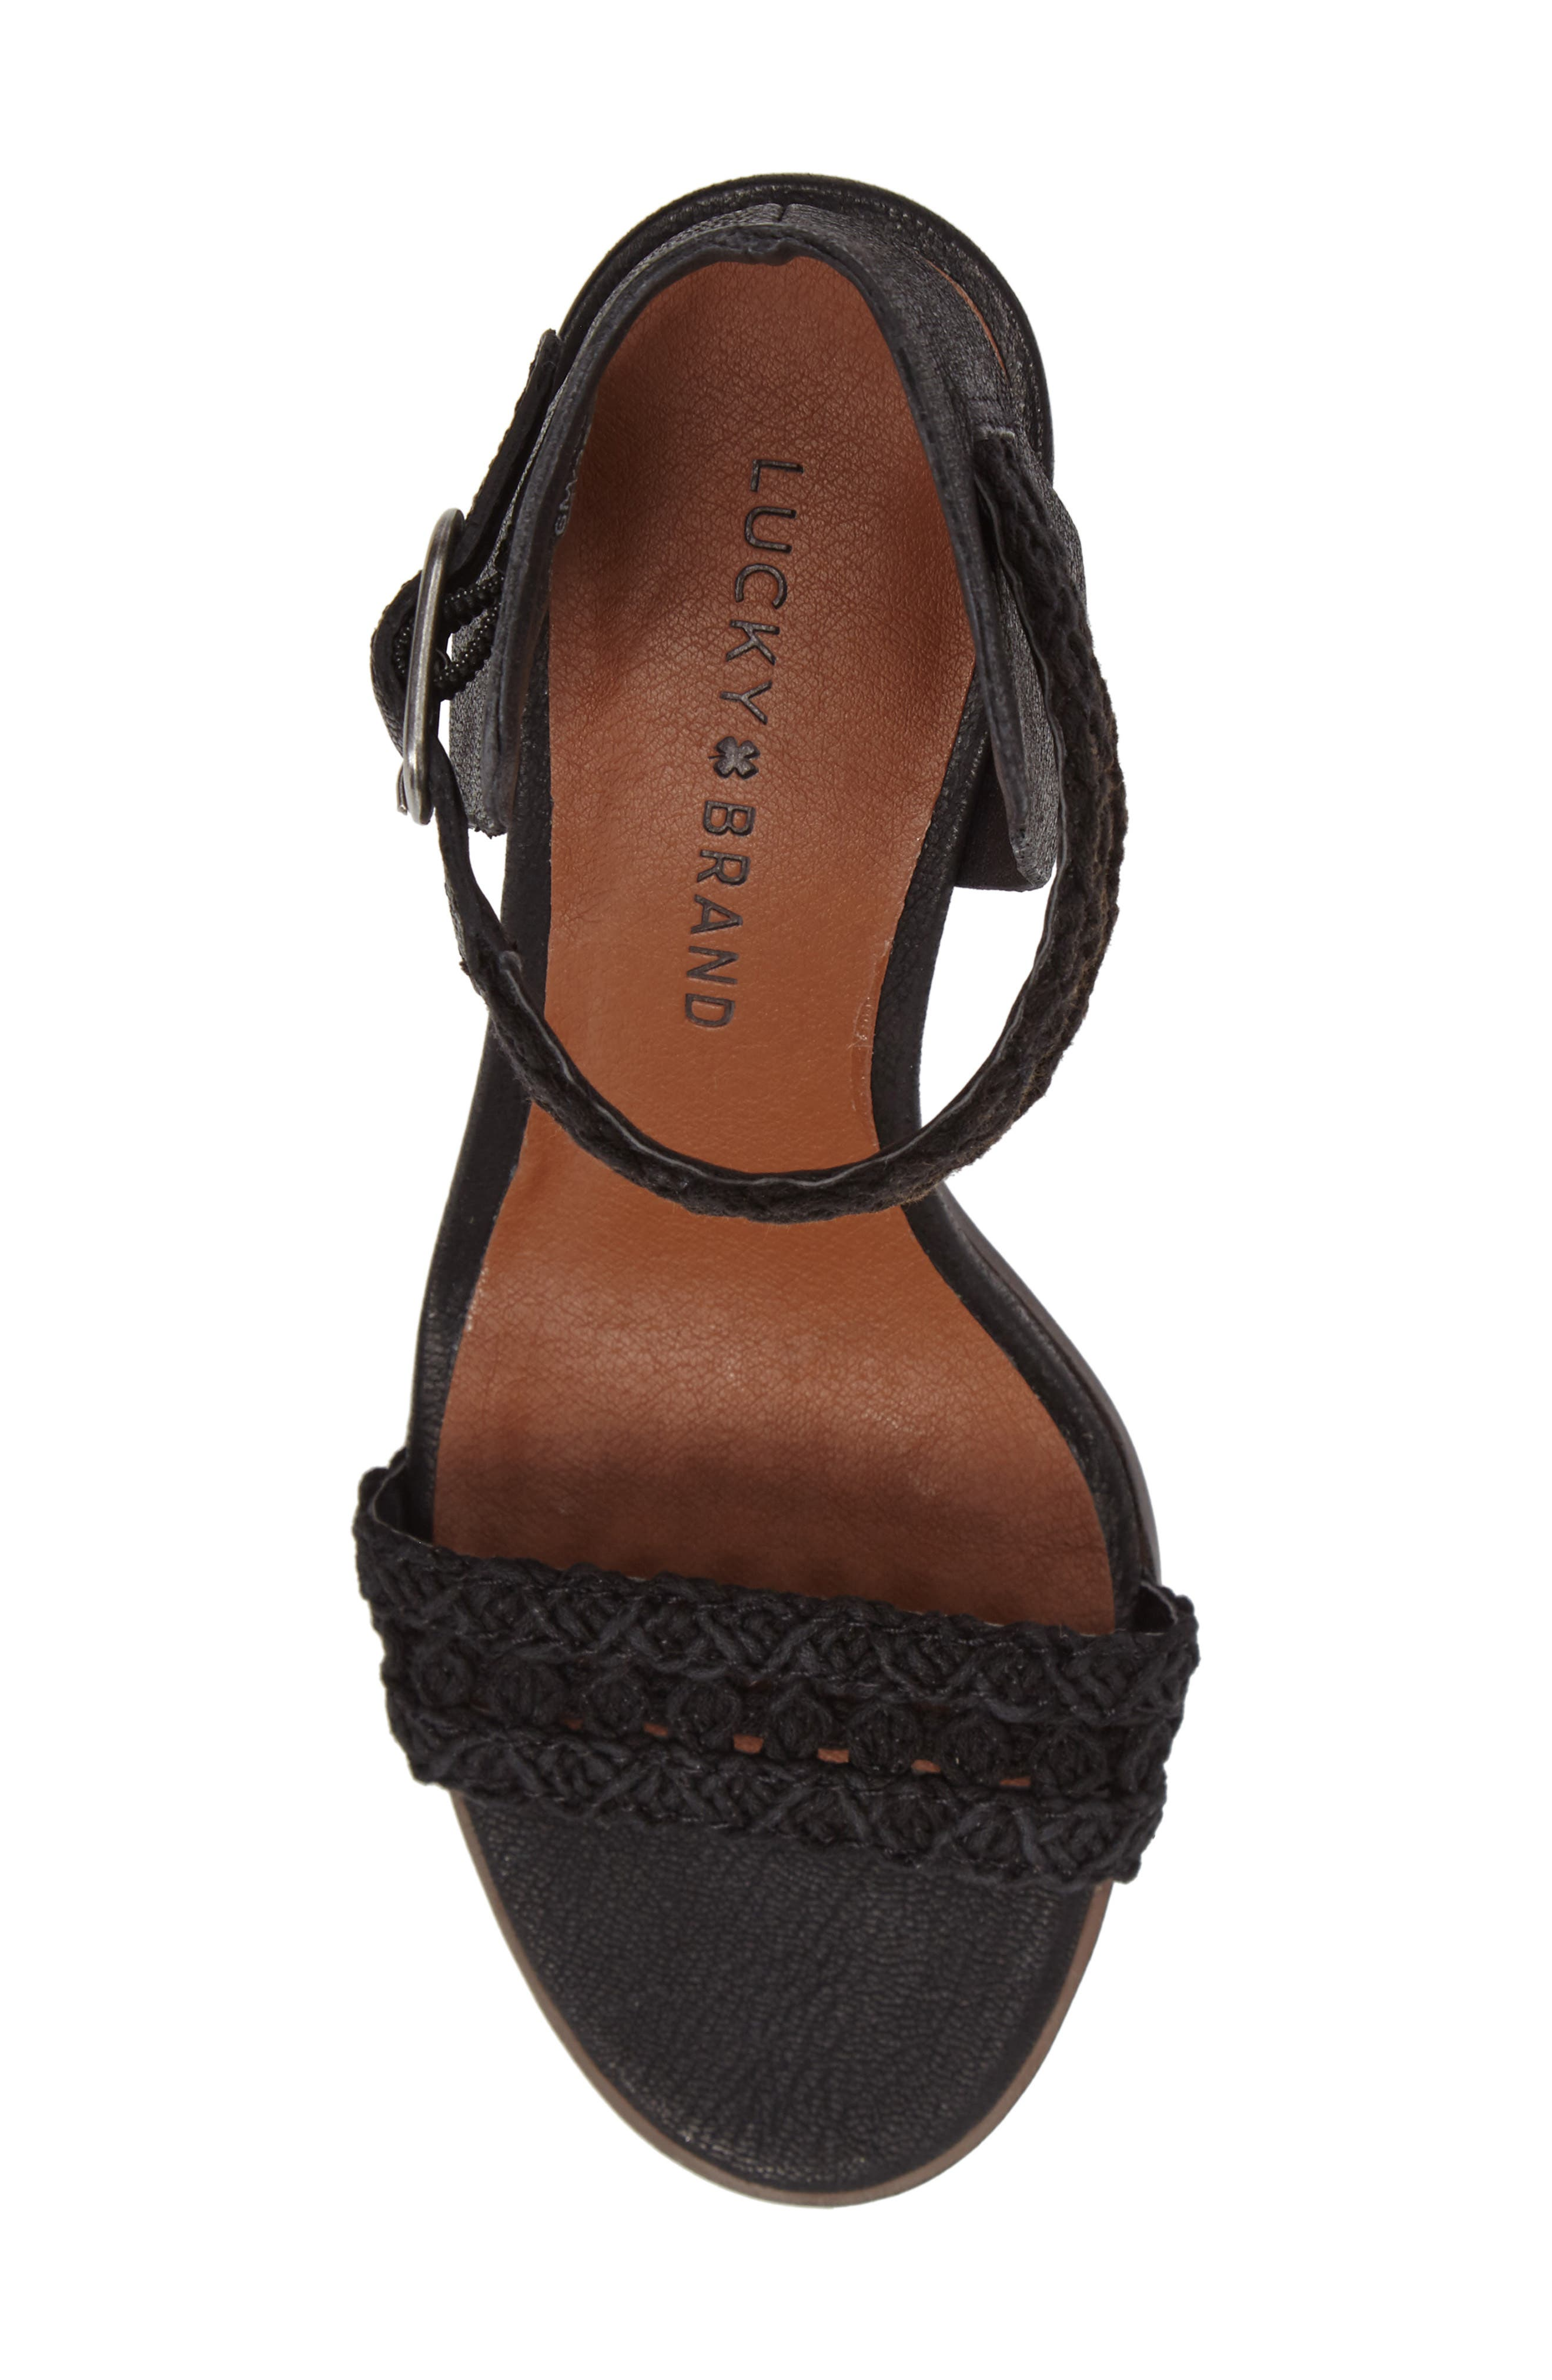 Oakes Ankle Strap Sandal,                             Alternate thumbnail 5, color,                             Black Leather